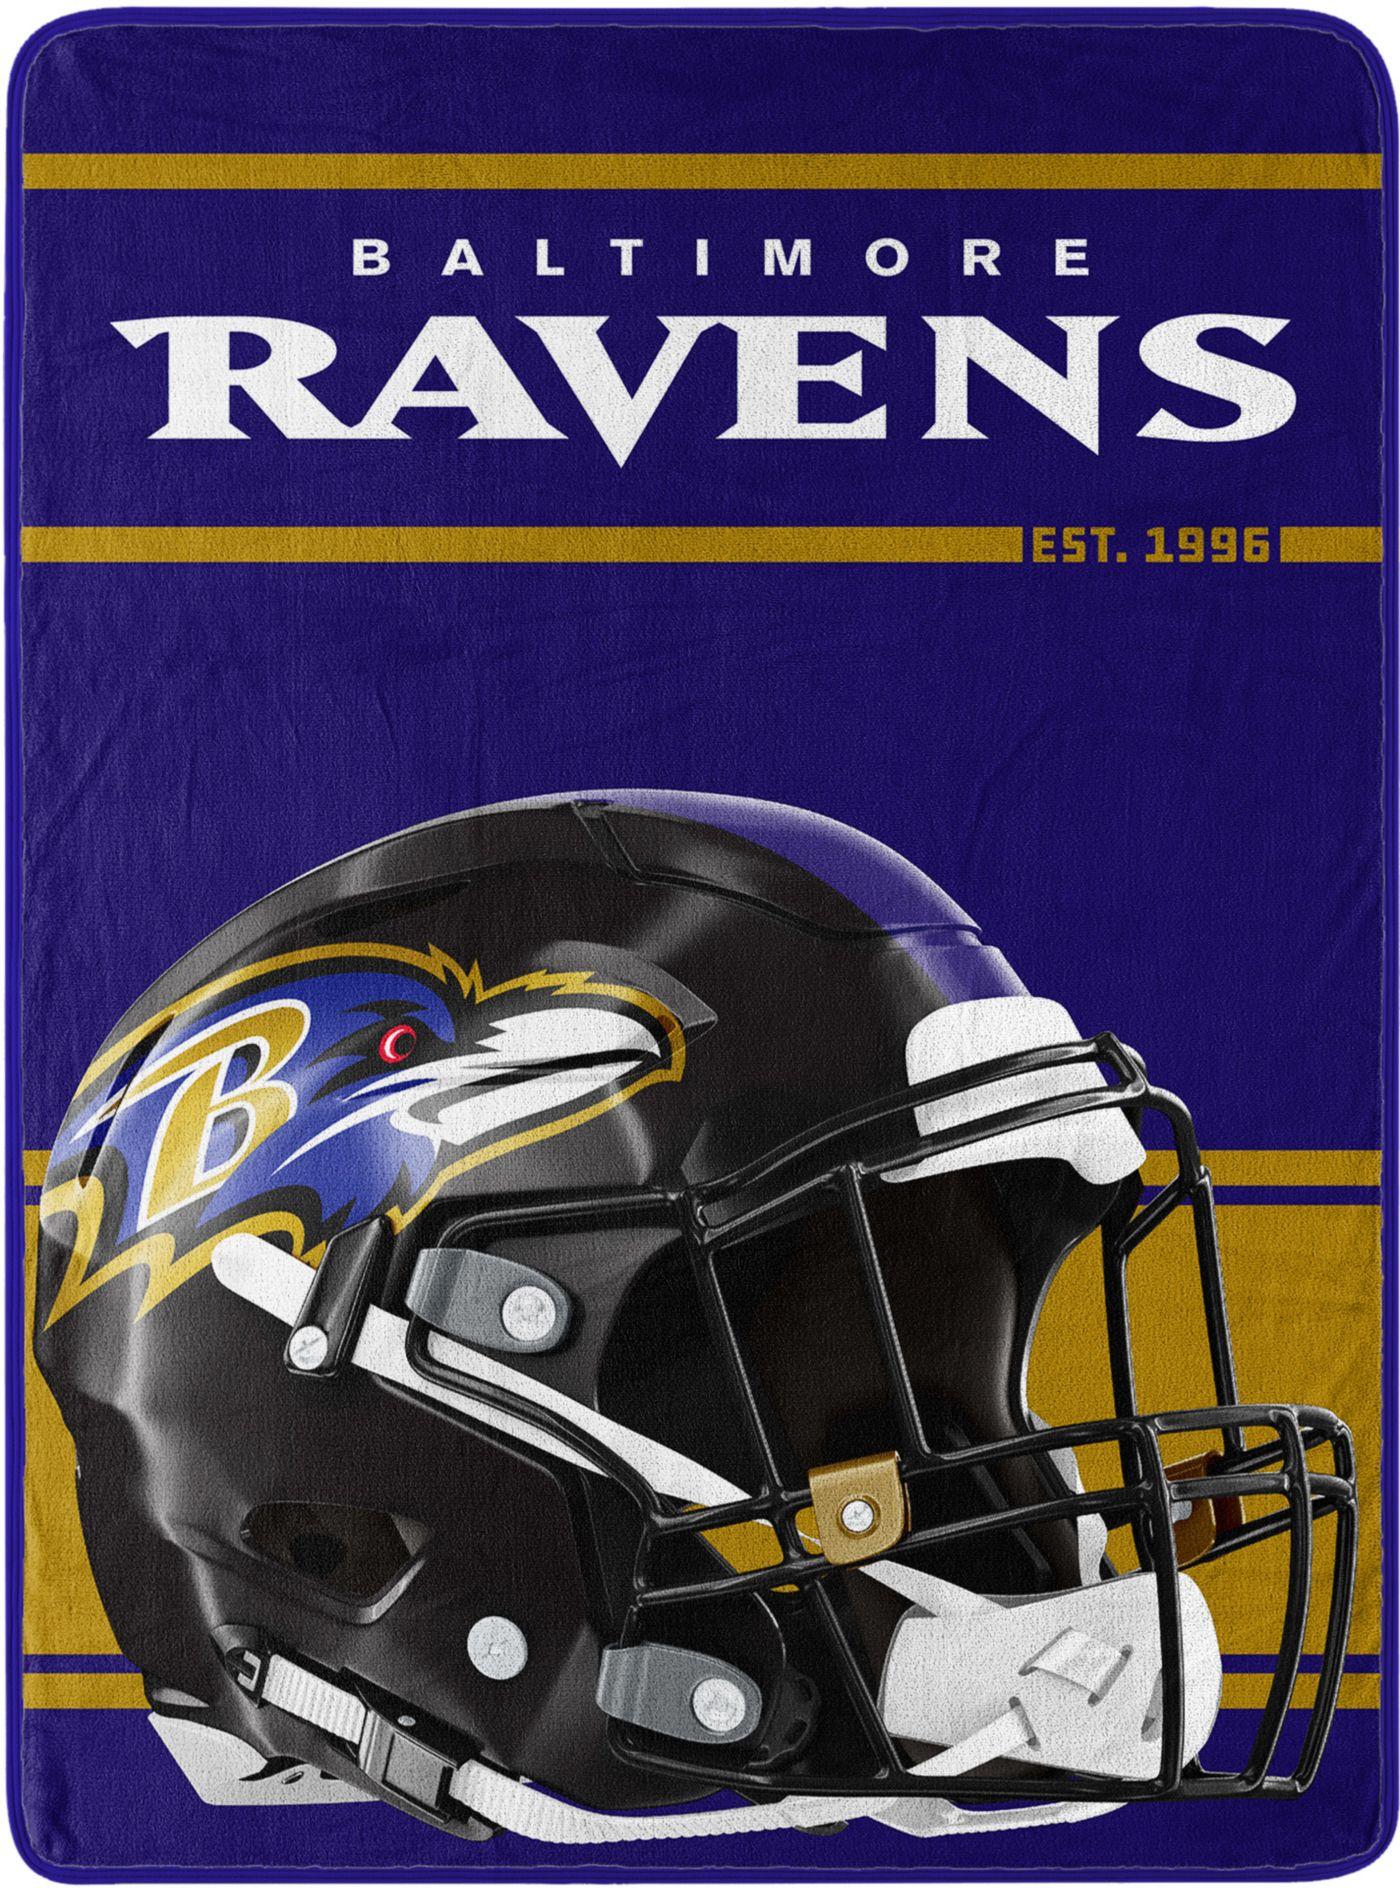 Northwest Baltimore Ravens Blanket